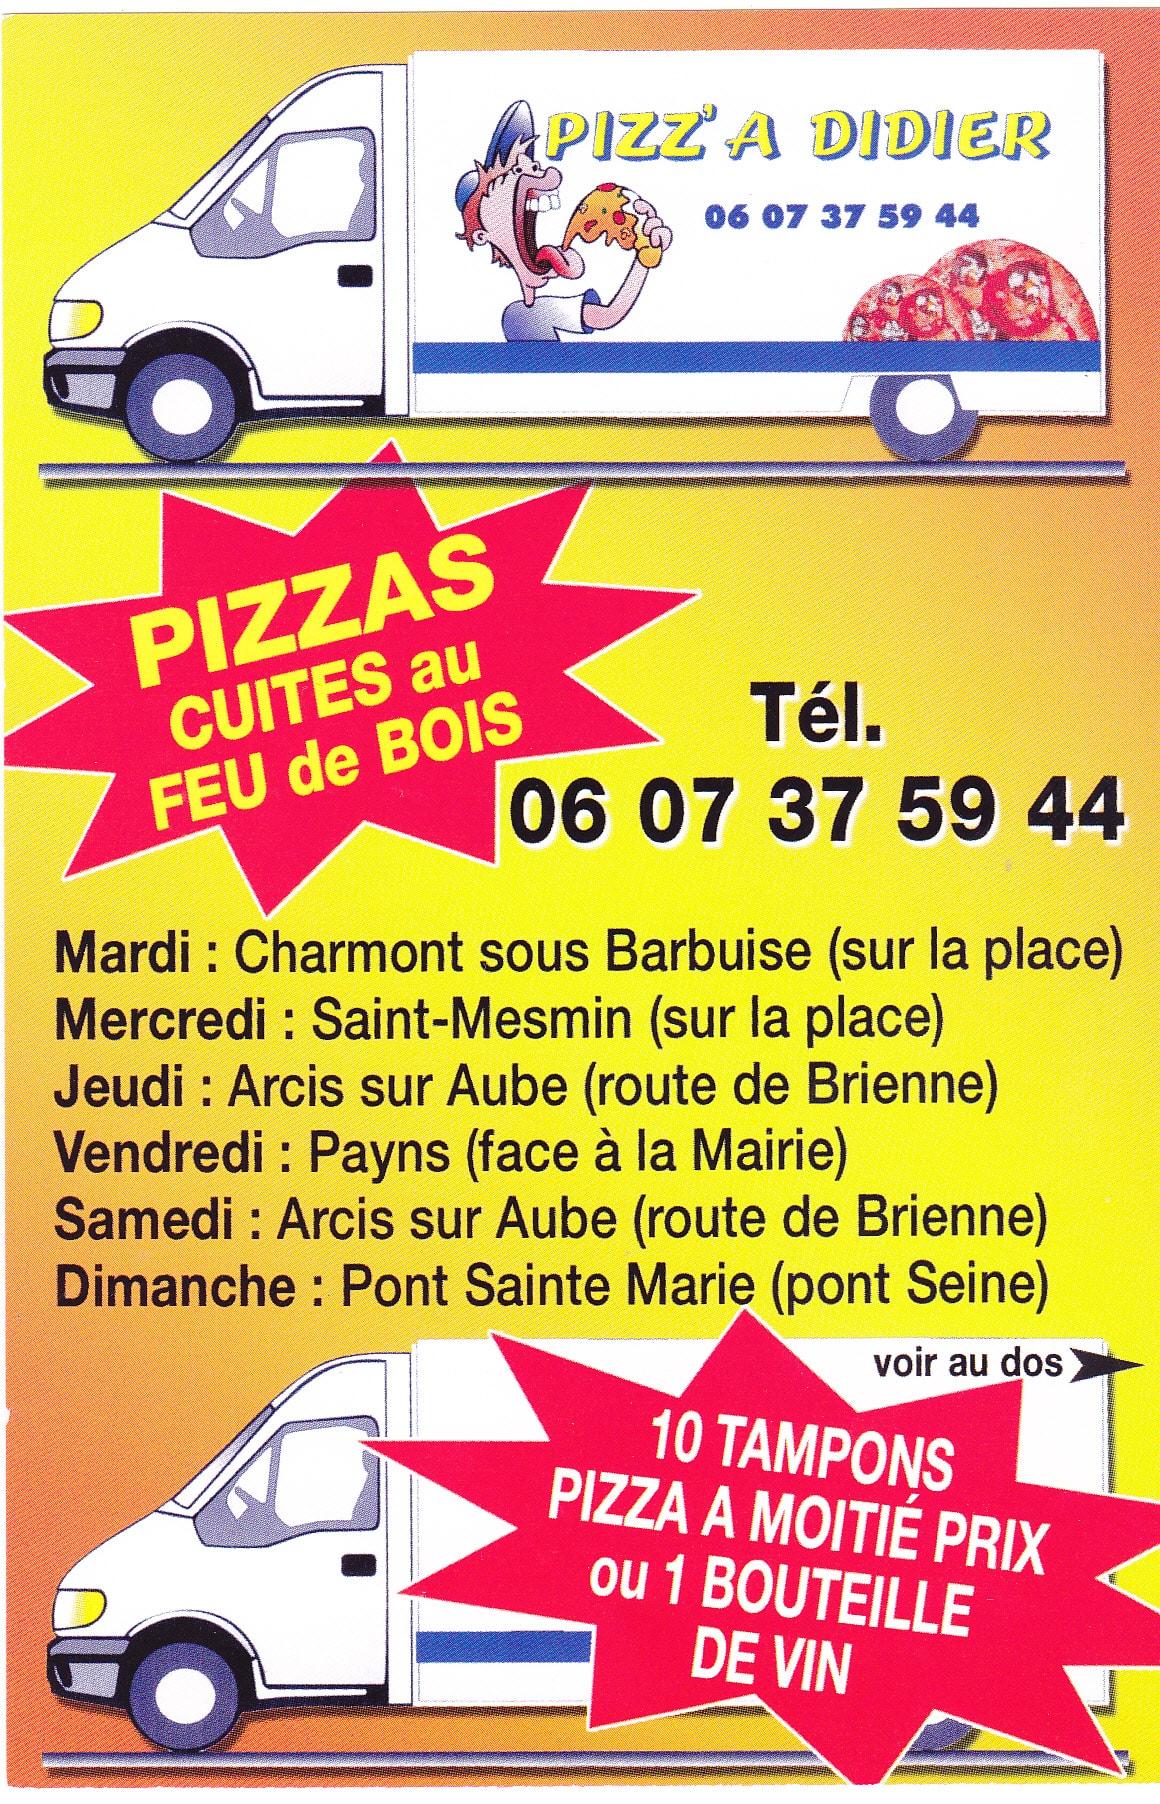 Pizza Didier